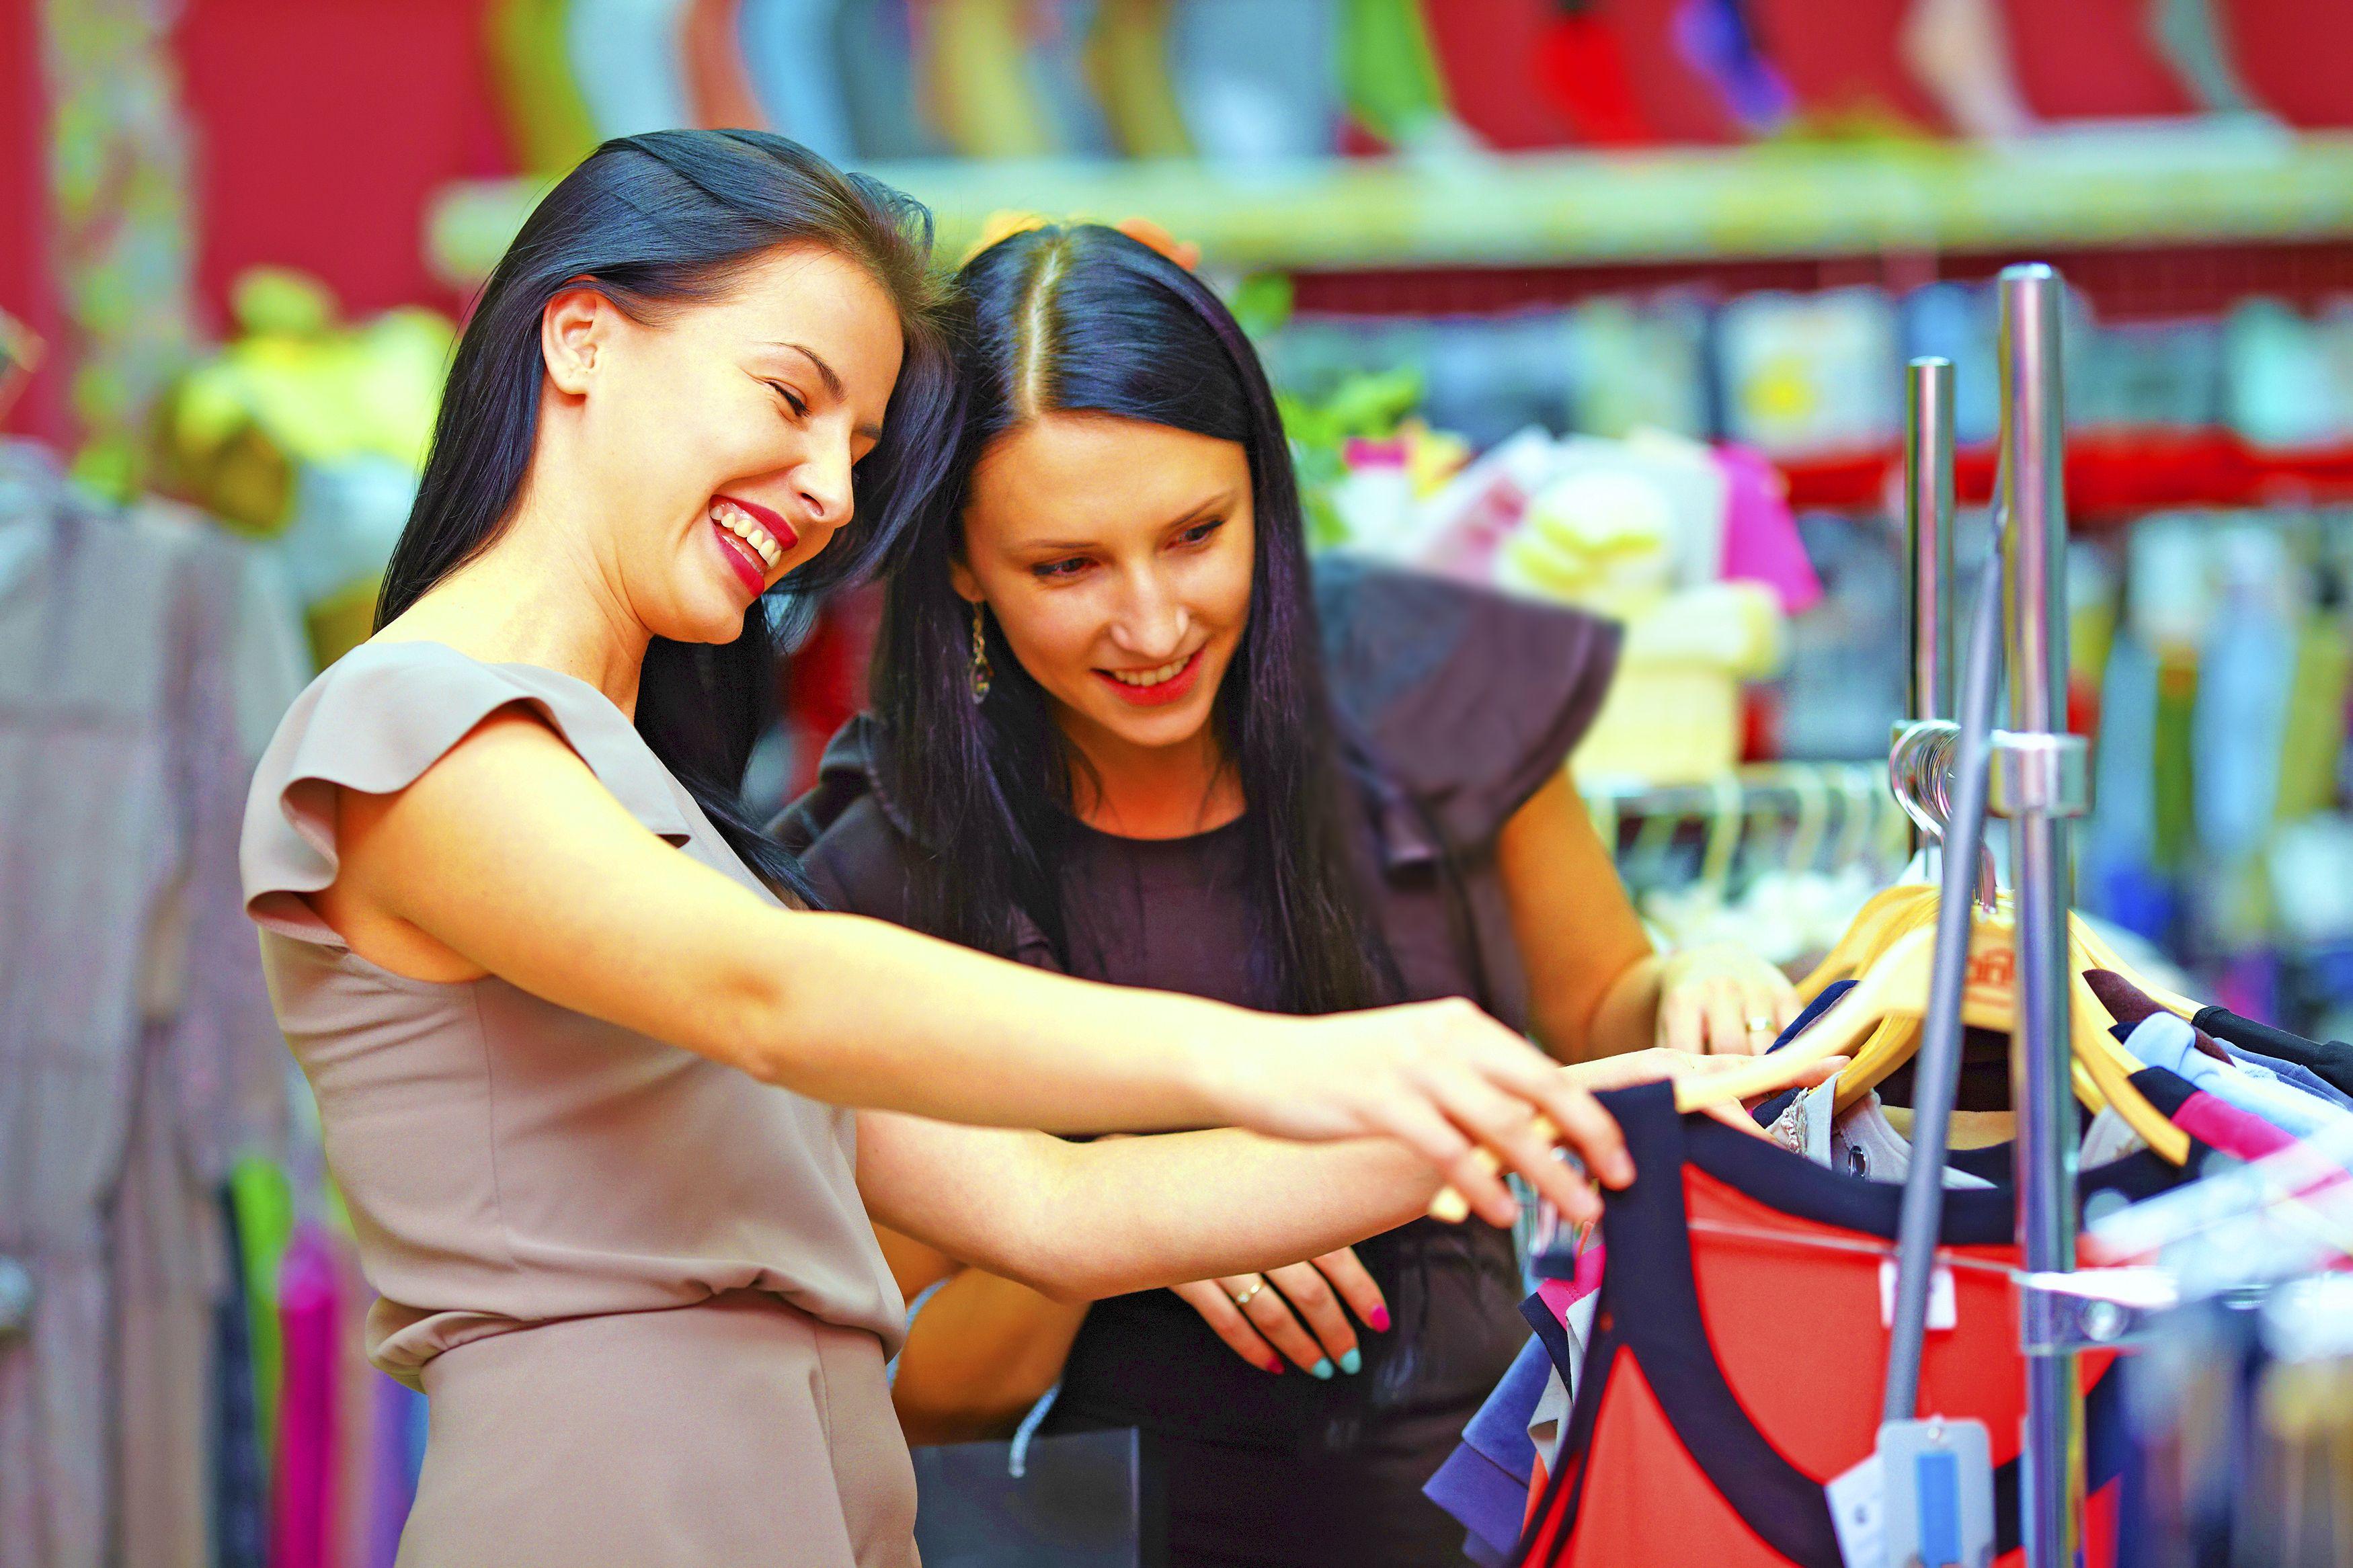 two happy girls buy dress on store sale